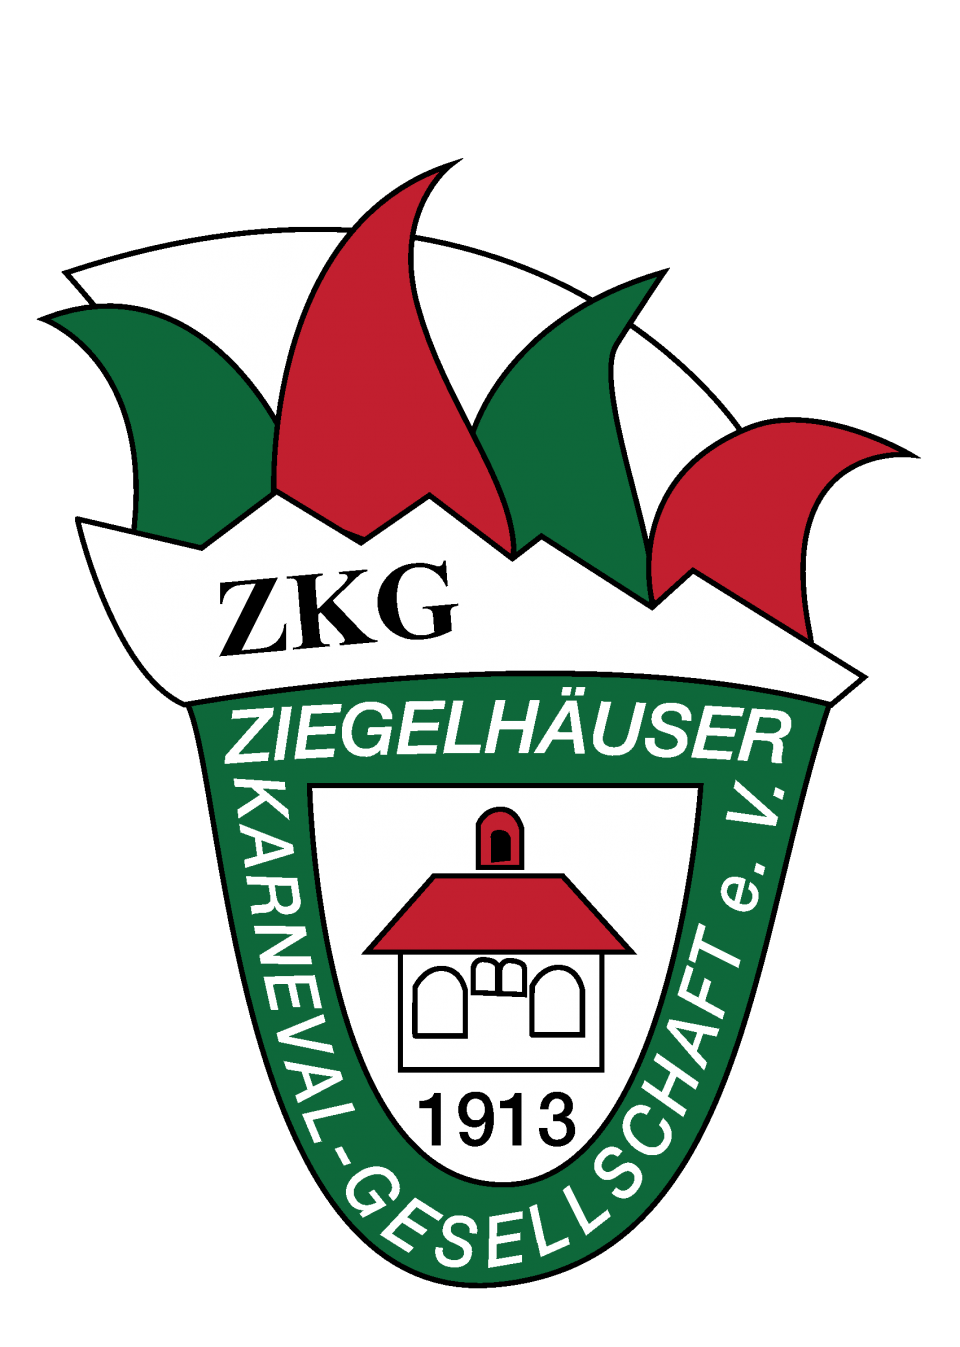 Ziegelhaeuser Karneval Gesellschaft 1913 e.V.